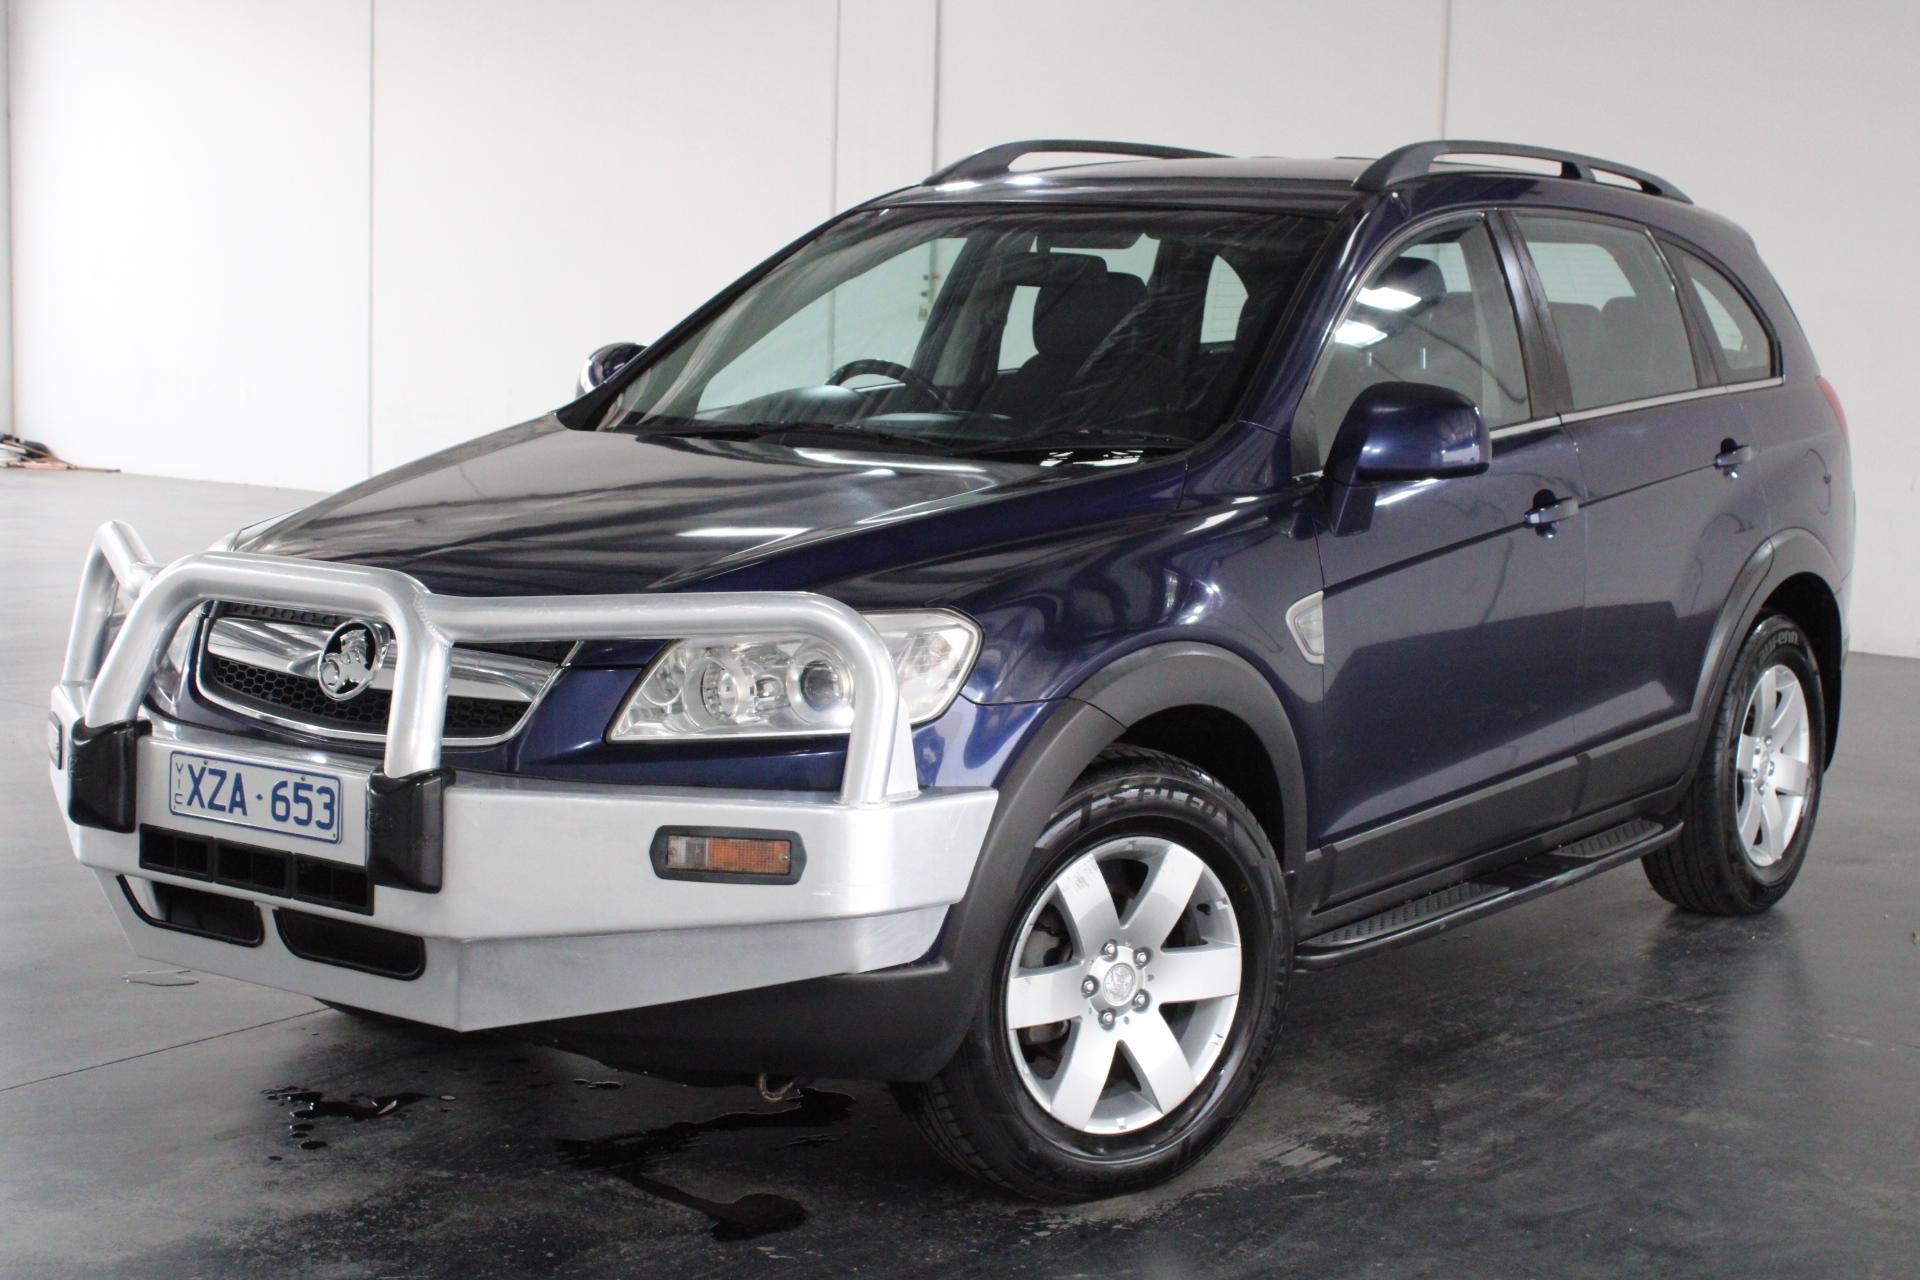 2008 Holden Captiva CX (4x4) CG Turbo Diesel Automatic 7 Seats Wagon